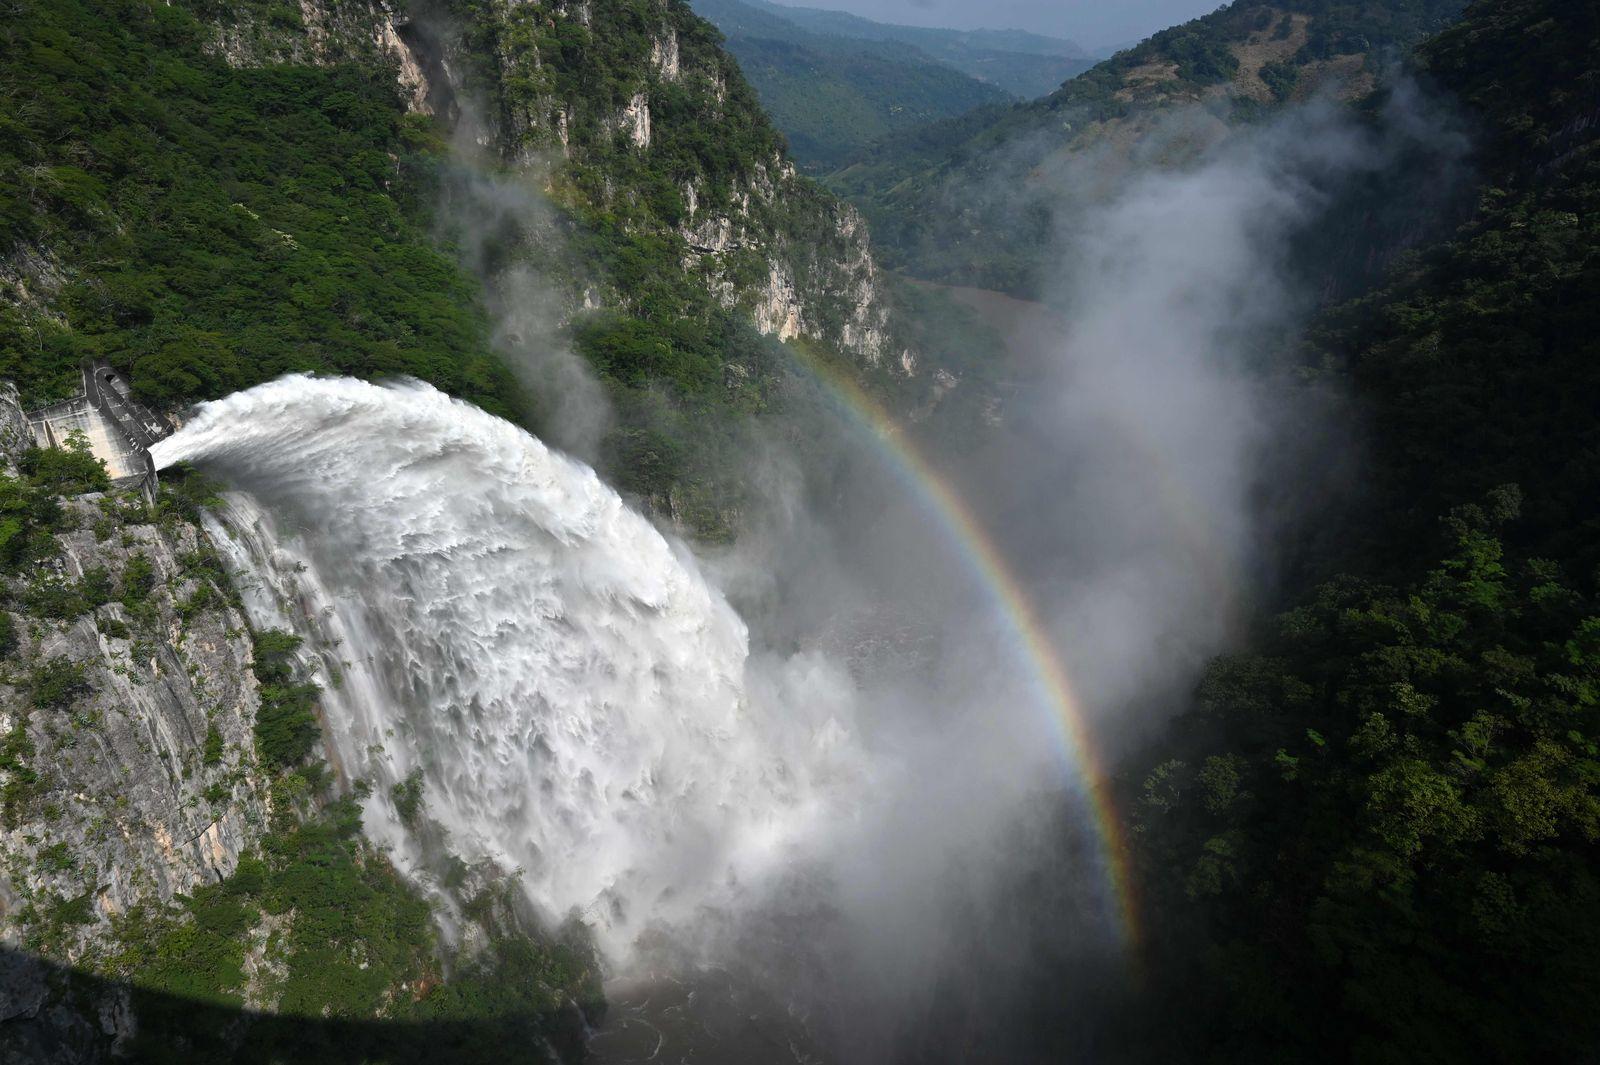 TOPSHOT-HONDURAS-WEATHER-TROPICAL STORM-IOTA-DAM